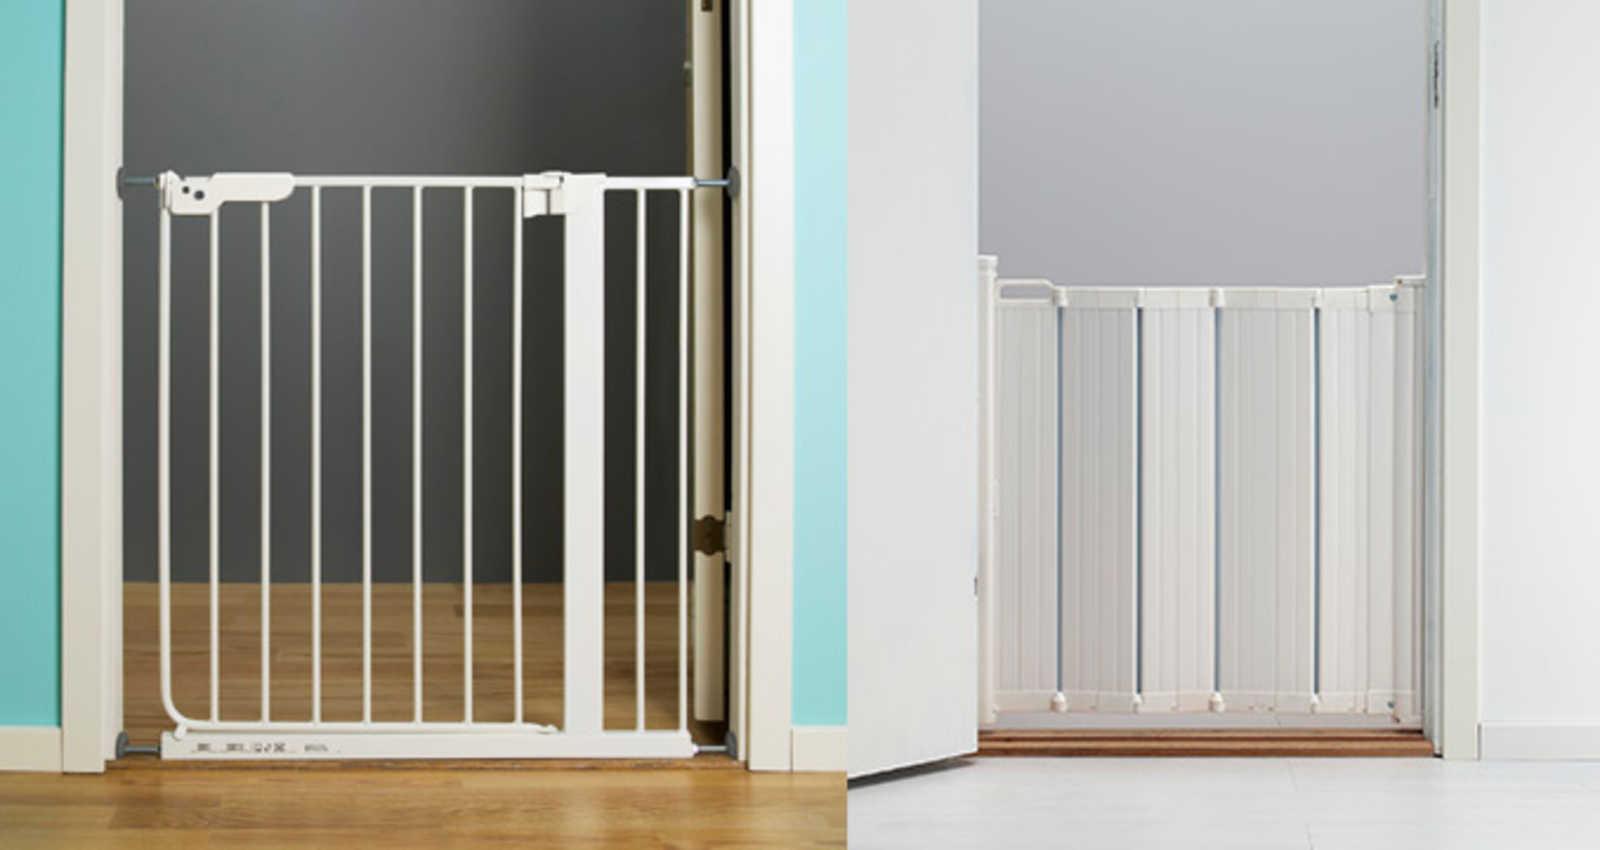 ikea ruft treppengitter patrull zur ck sturzgefahr antenne bayern. Black Bedroom Furniture Sets. Home Design Ideas